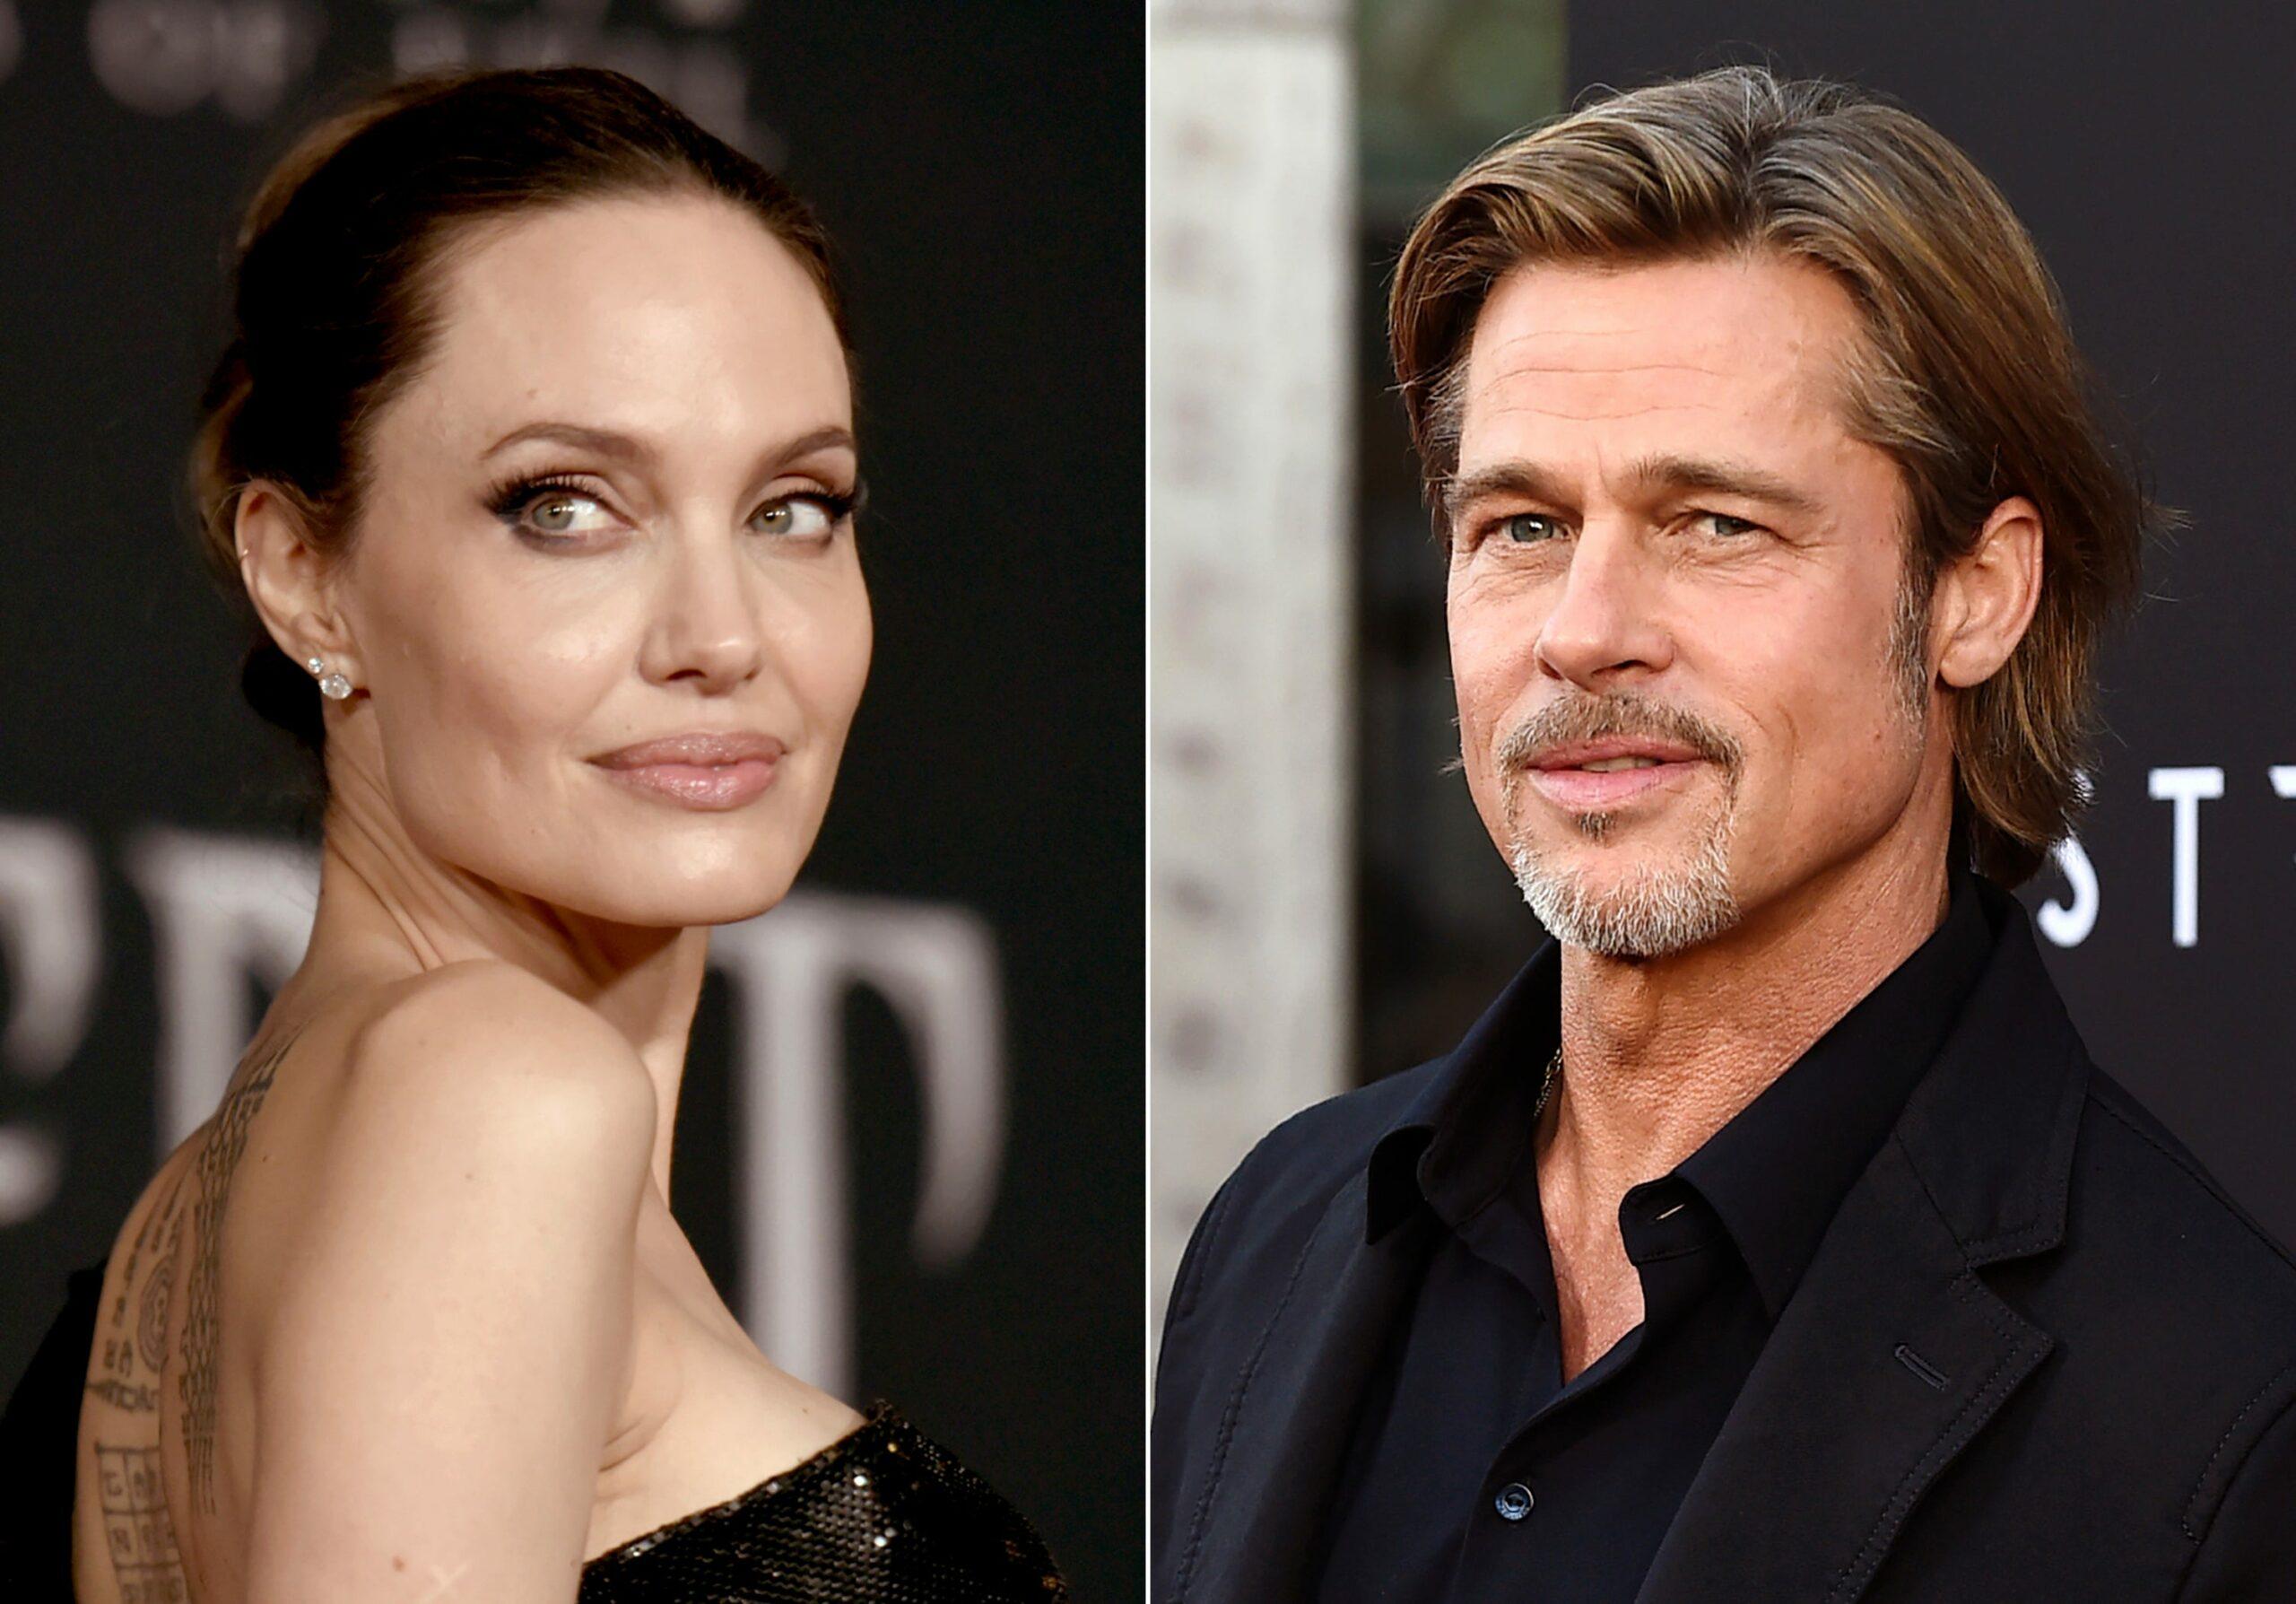 Angelina Jolie Jual Lukisan Dari Mantan, Laku 11.5 juta Dollar!